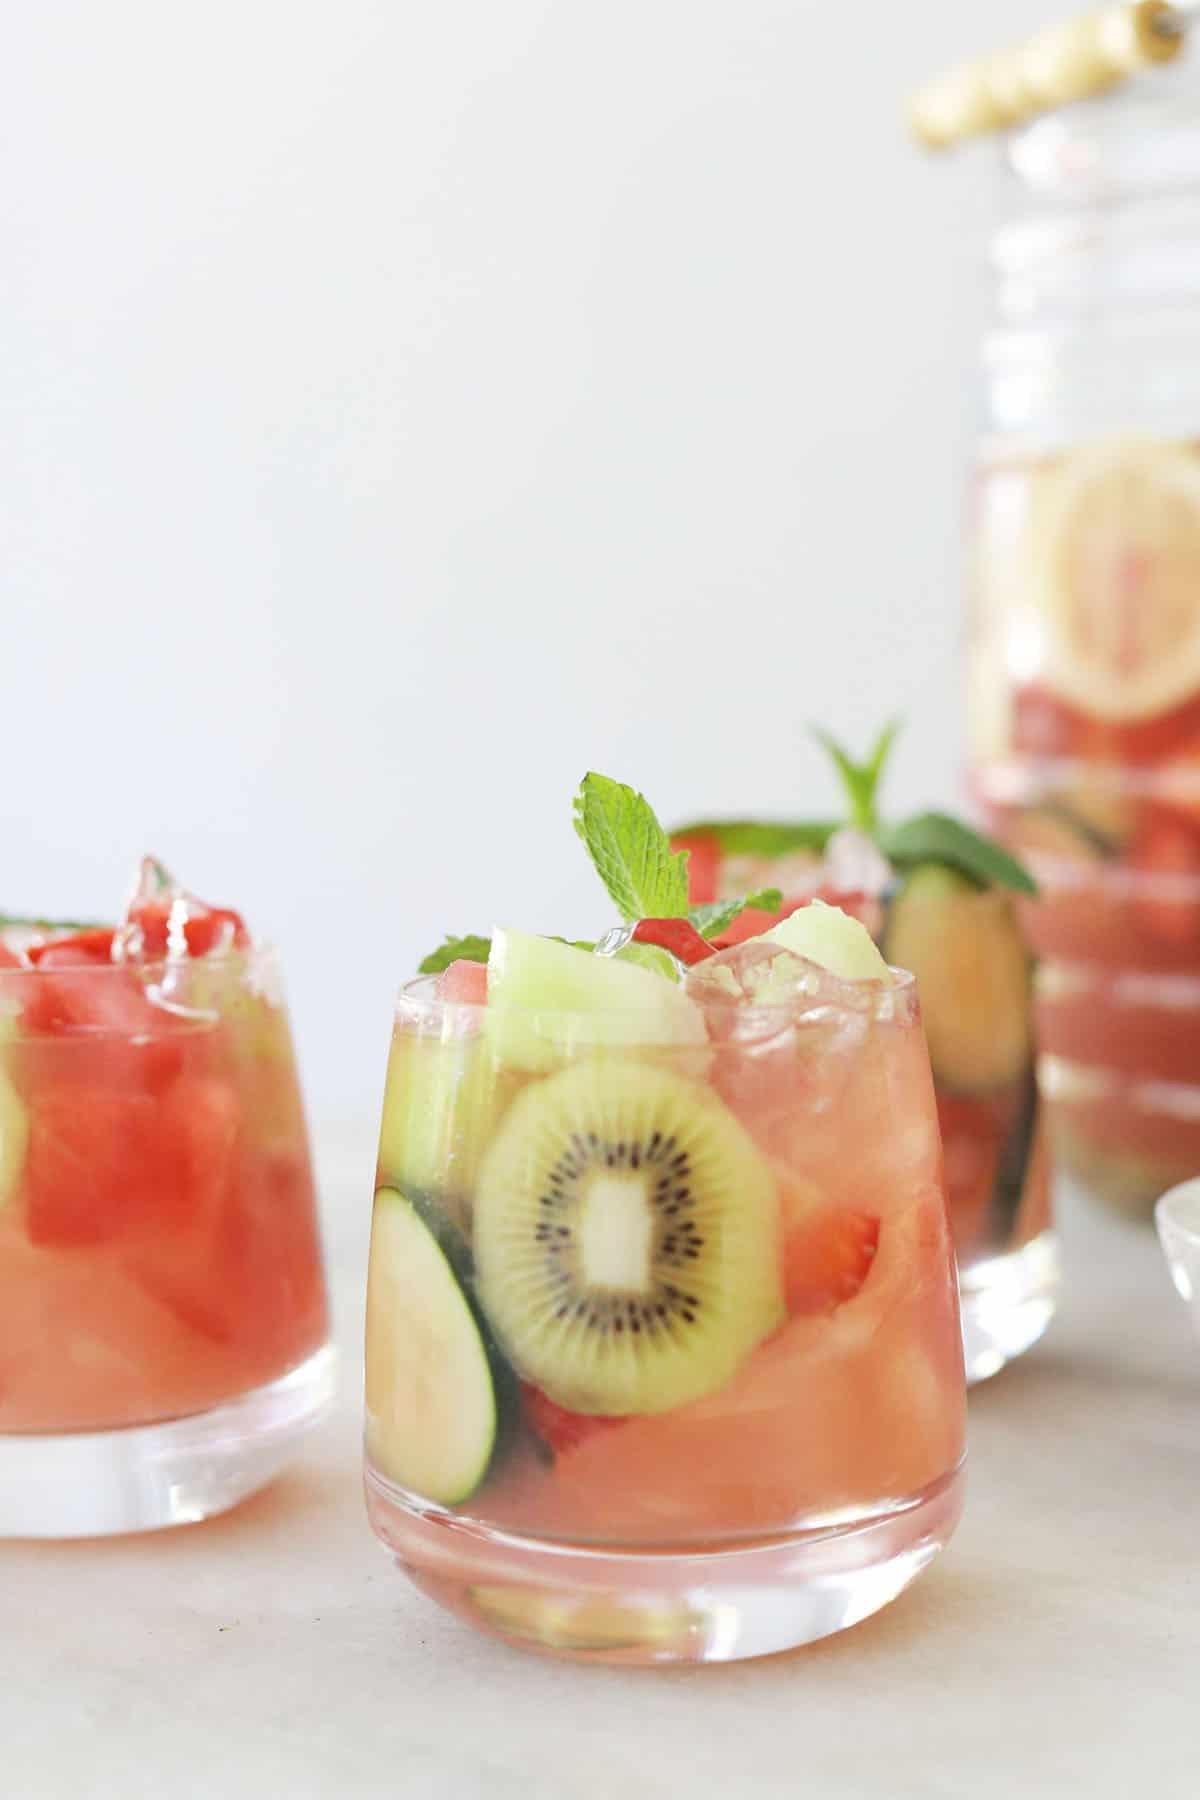 white wine sangria with watermelon